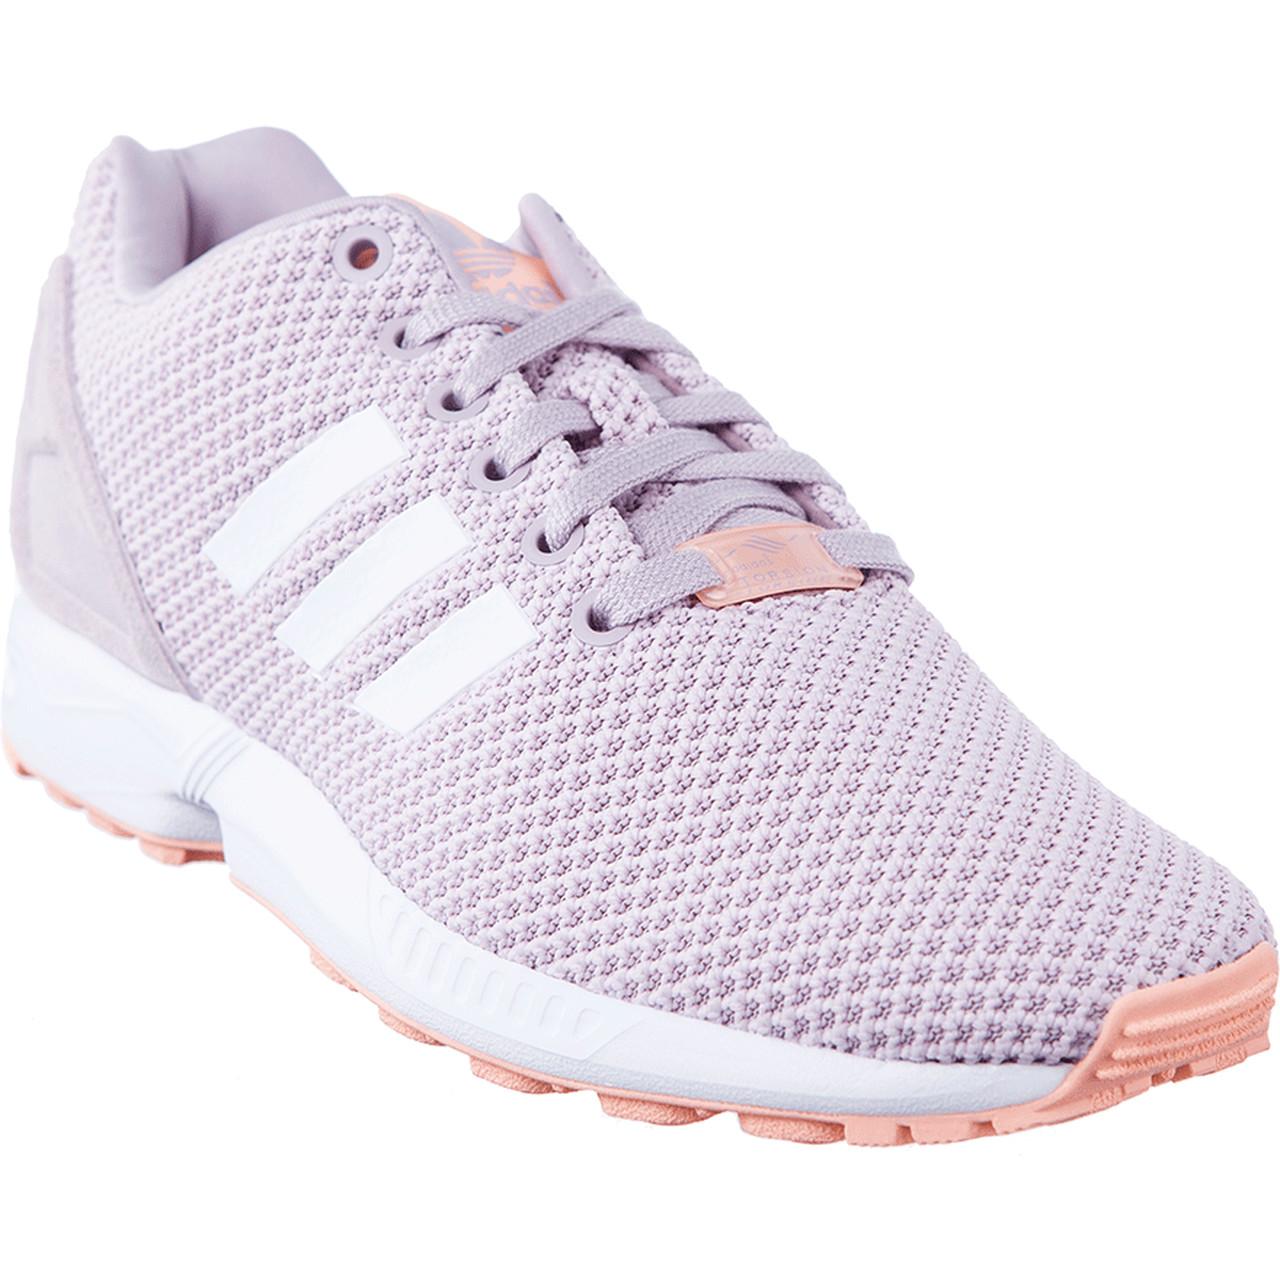 buty adidas zx flux w aq3069